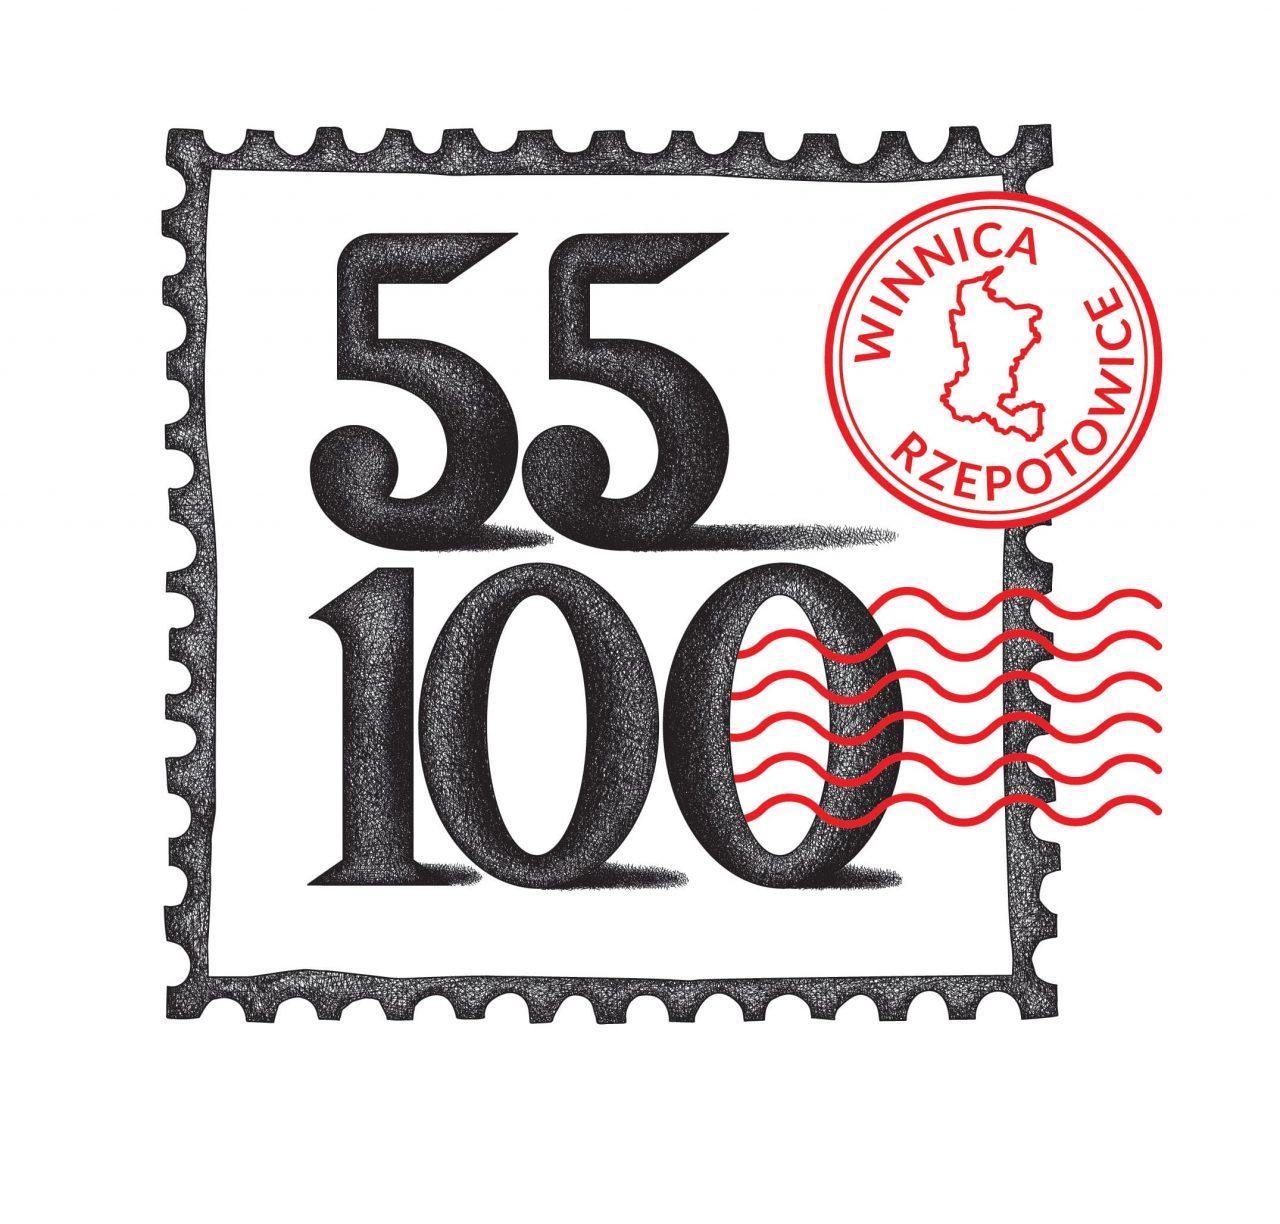 Logo, winnica 55/100